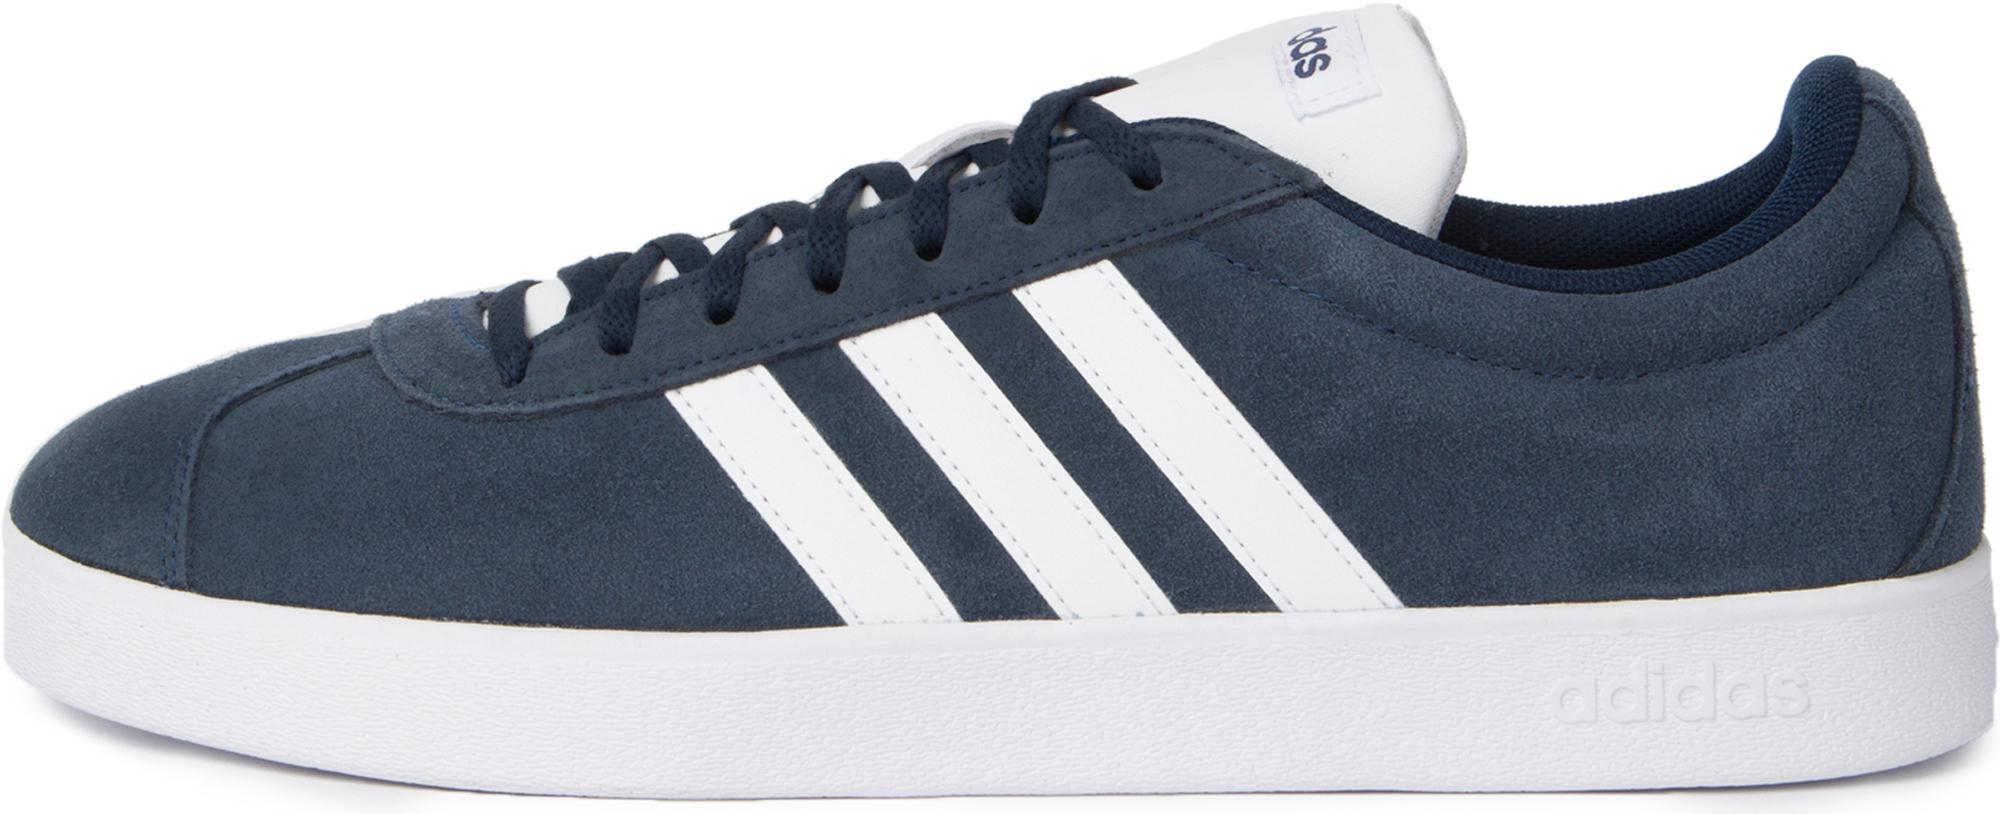 Adidas Кеды мужские Adidas Vl Court 2.0, размер 41